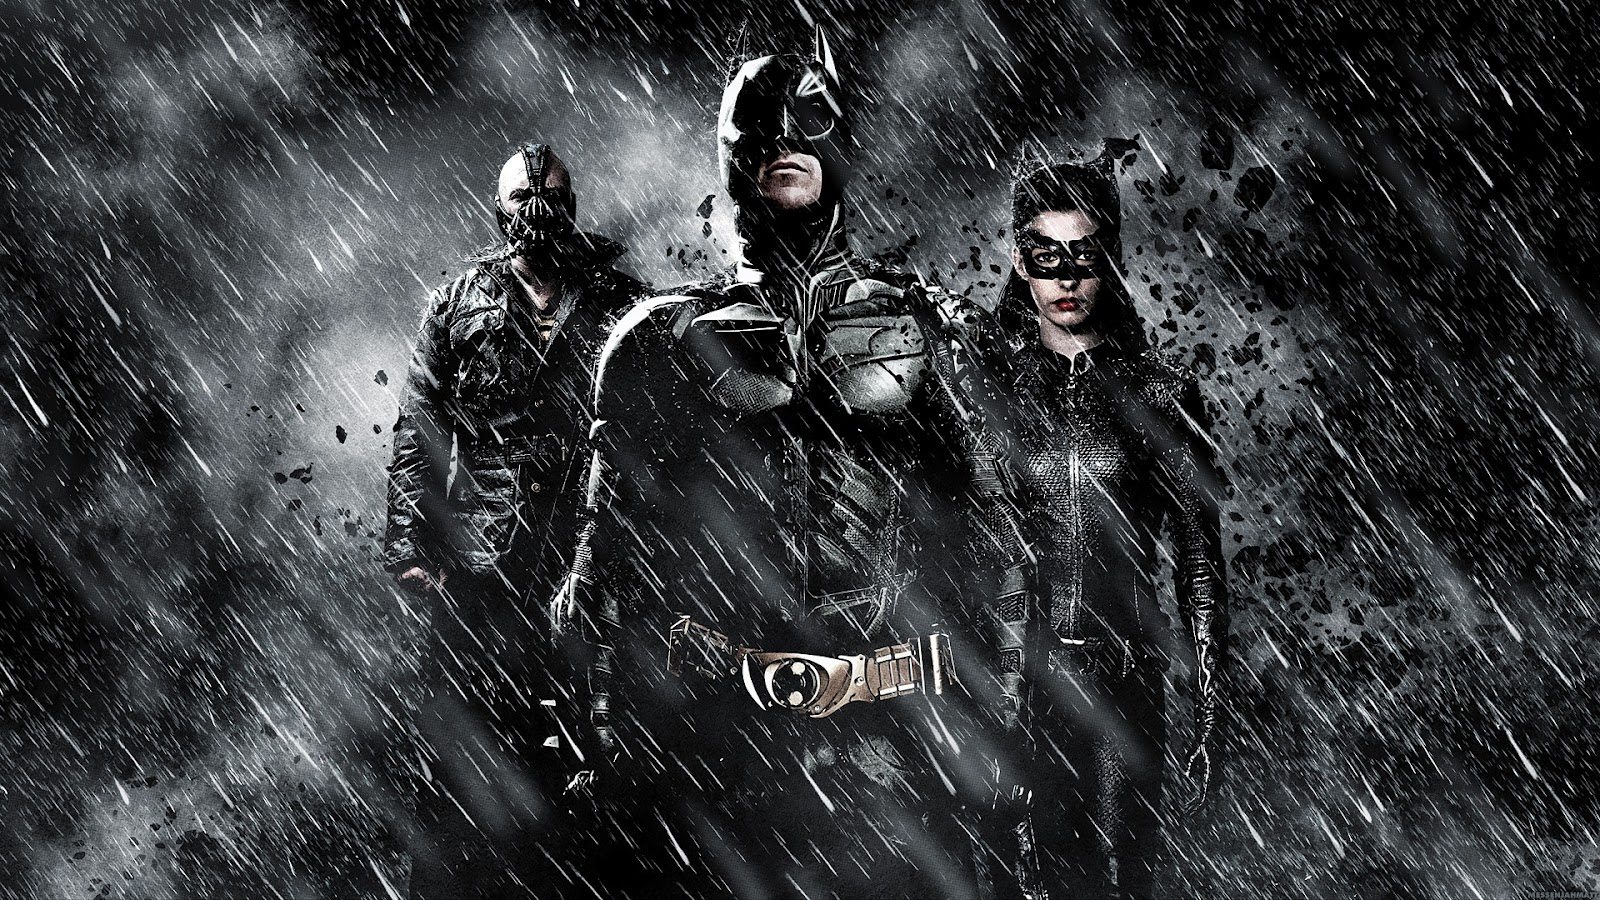 http://3.bp.blogspot.com/-yTS-WFZyXEY/ULWVdWGaUaI/AAAAAAAANdw/tUZkuqGGvAU/s1600/Batman-The-Dark-Knight-Rises_Wallpapers-HD.jpg